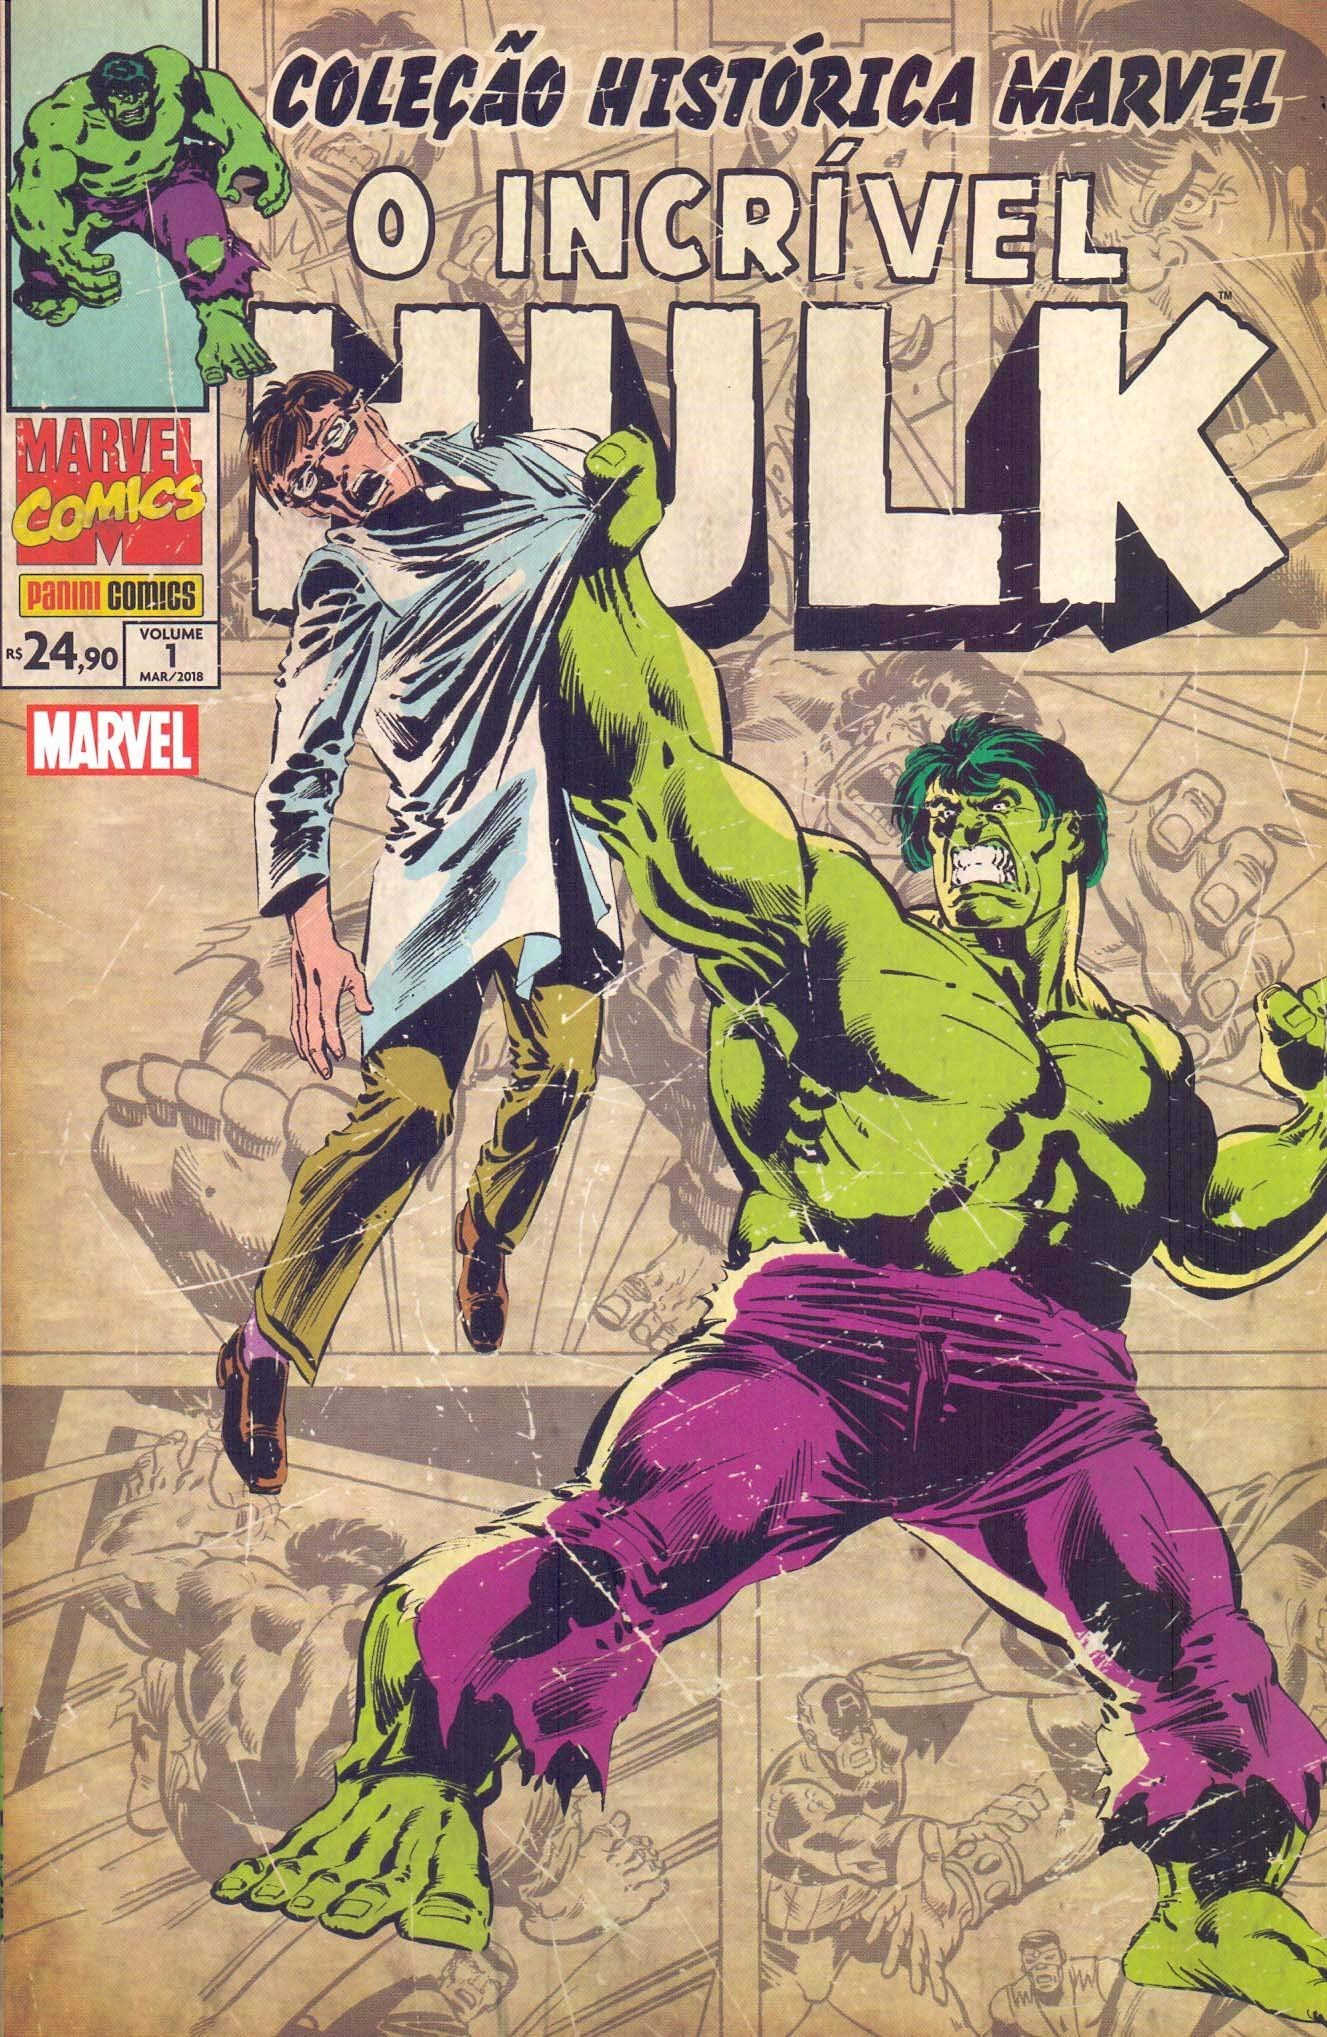 Coleção Histórica Marvel. O Incrível Hulk - Volume 1 ...